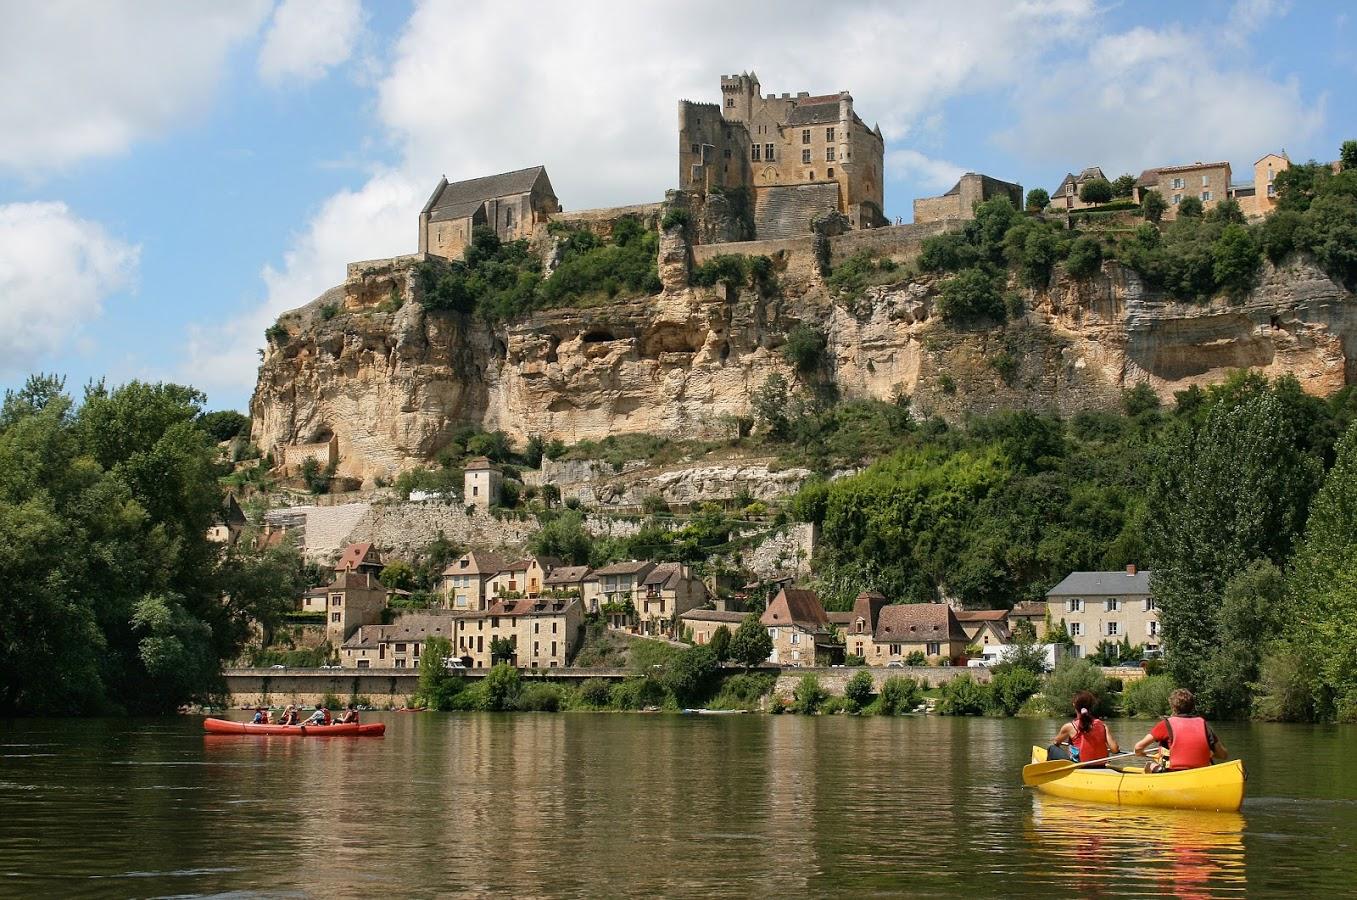 kayaking-on-river-dordogne-chc3a2teau-de